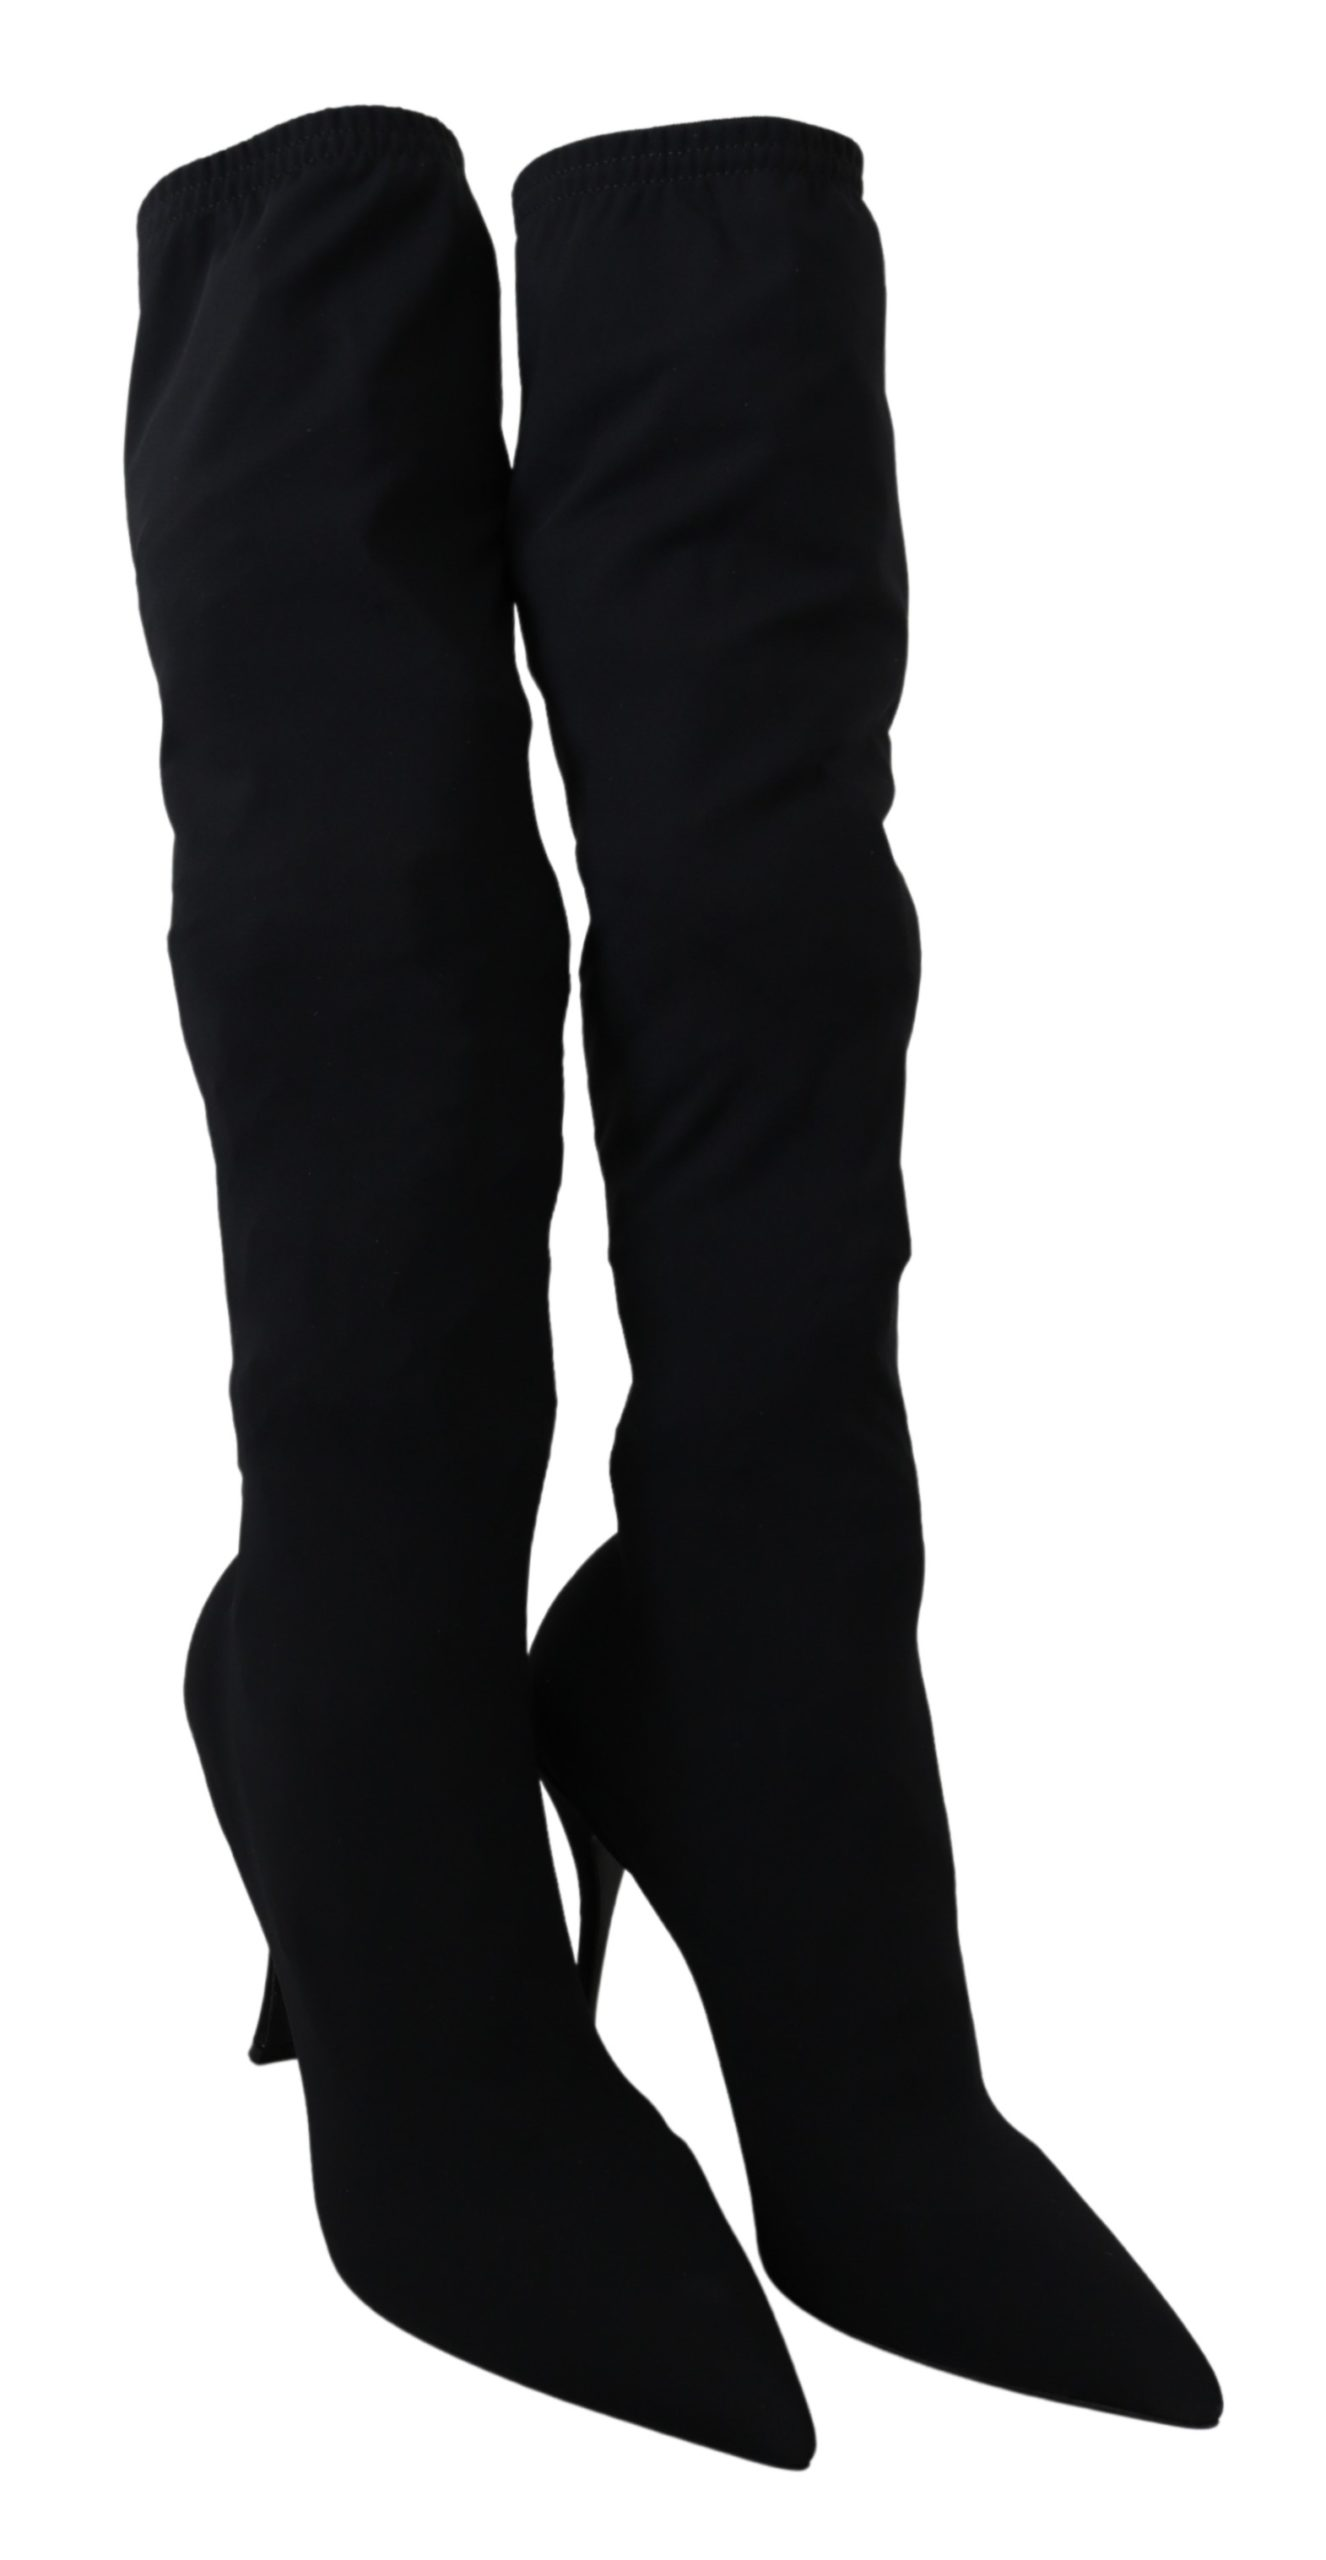 Black Jersey Stretch Knee High Boots - EU40/US9.5